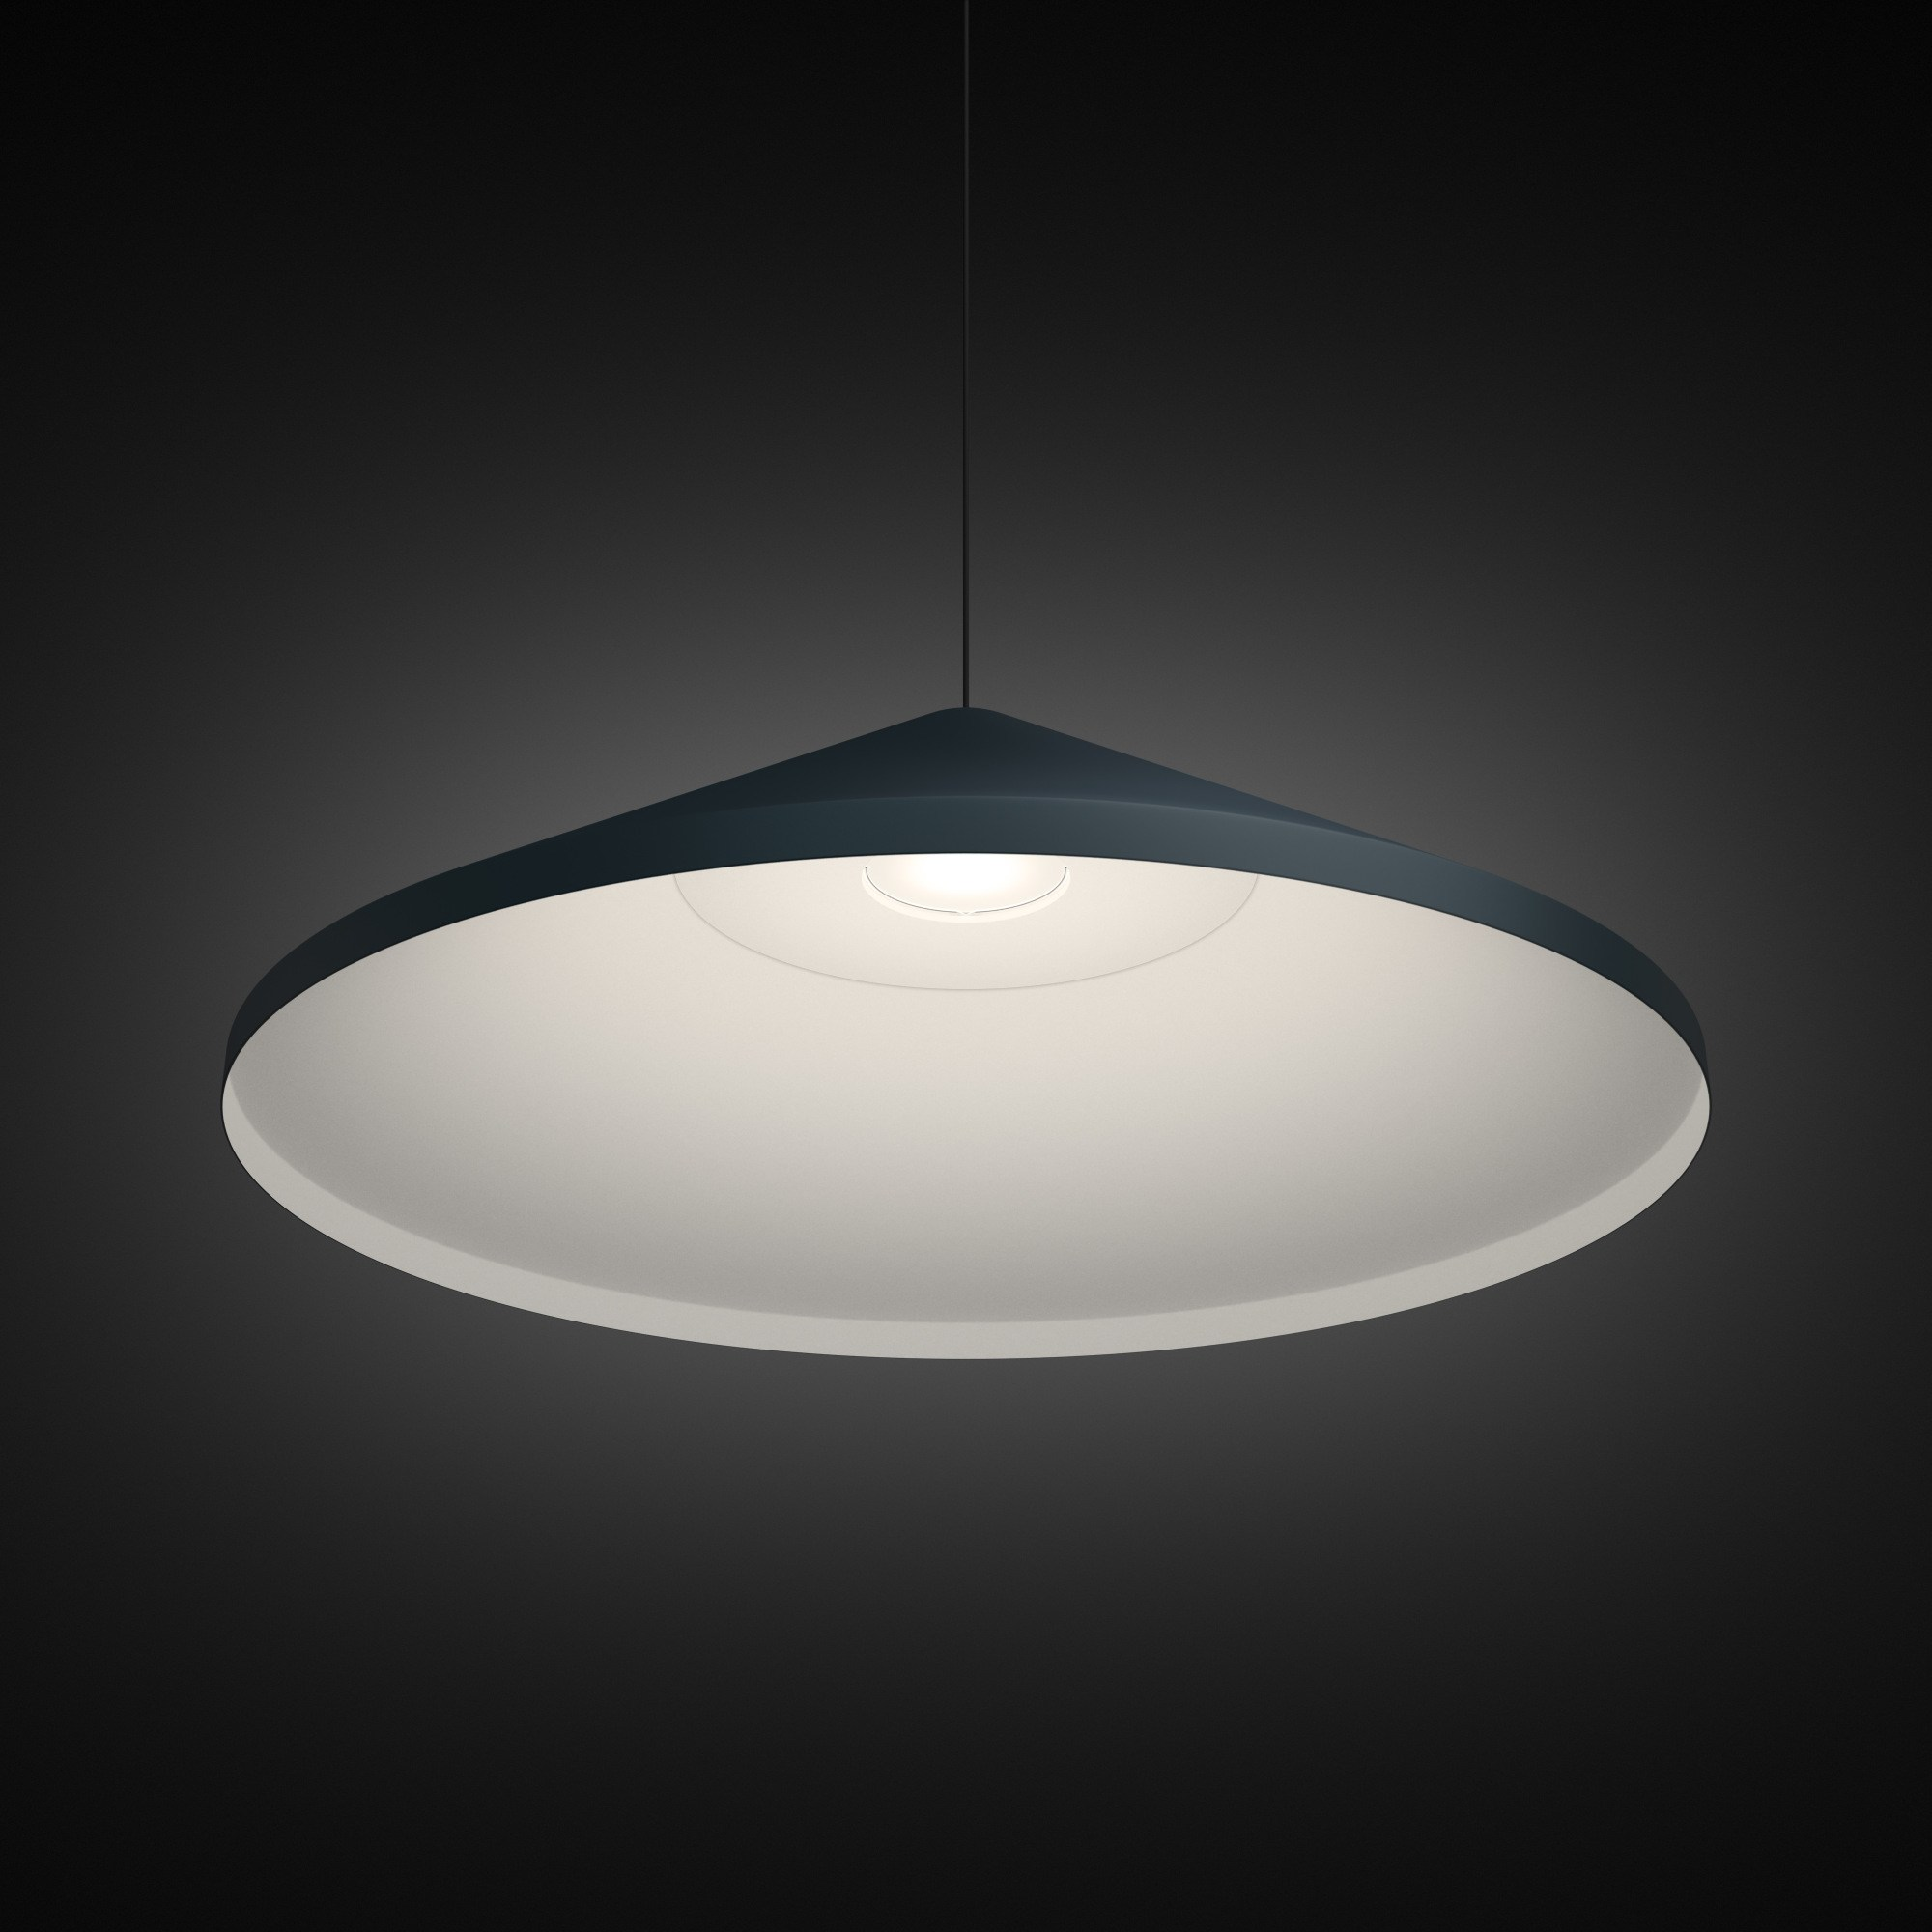 north pendant lamp by vibia design arik levy. Black Bedroom Furniture Sets. Home Design Ideas